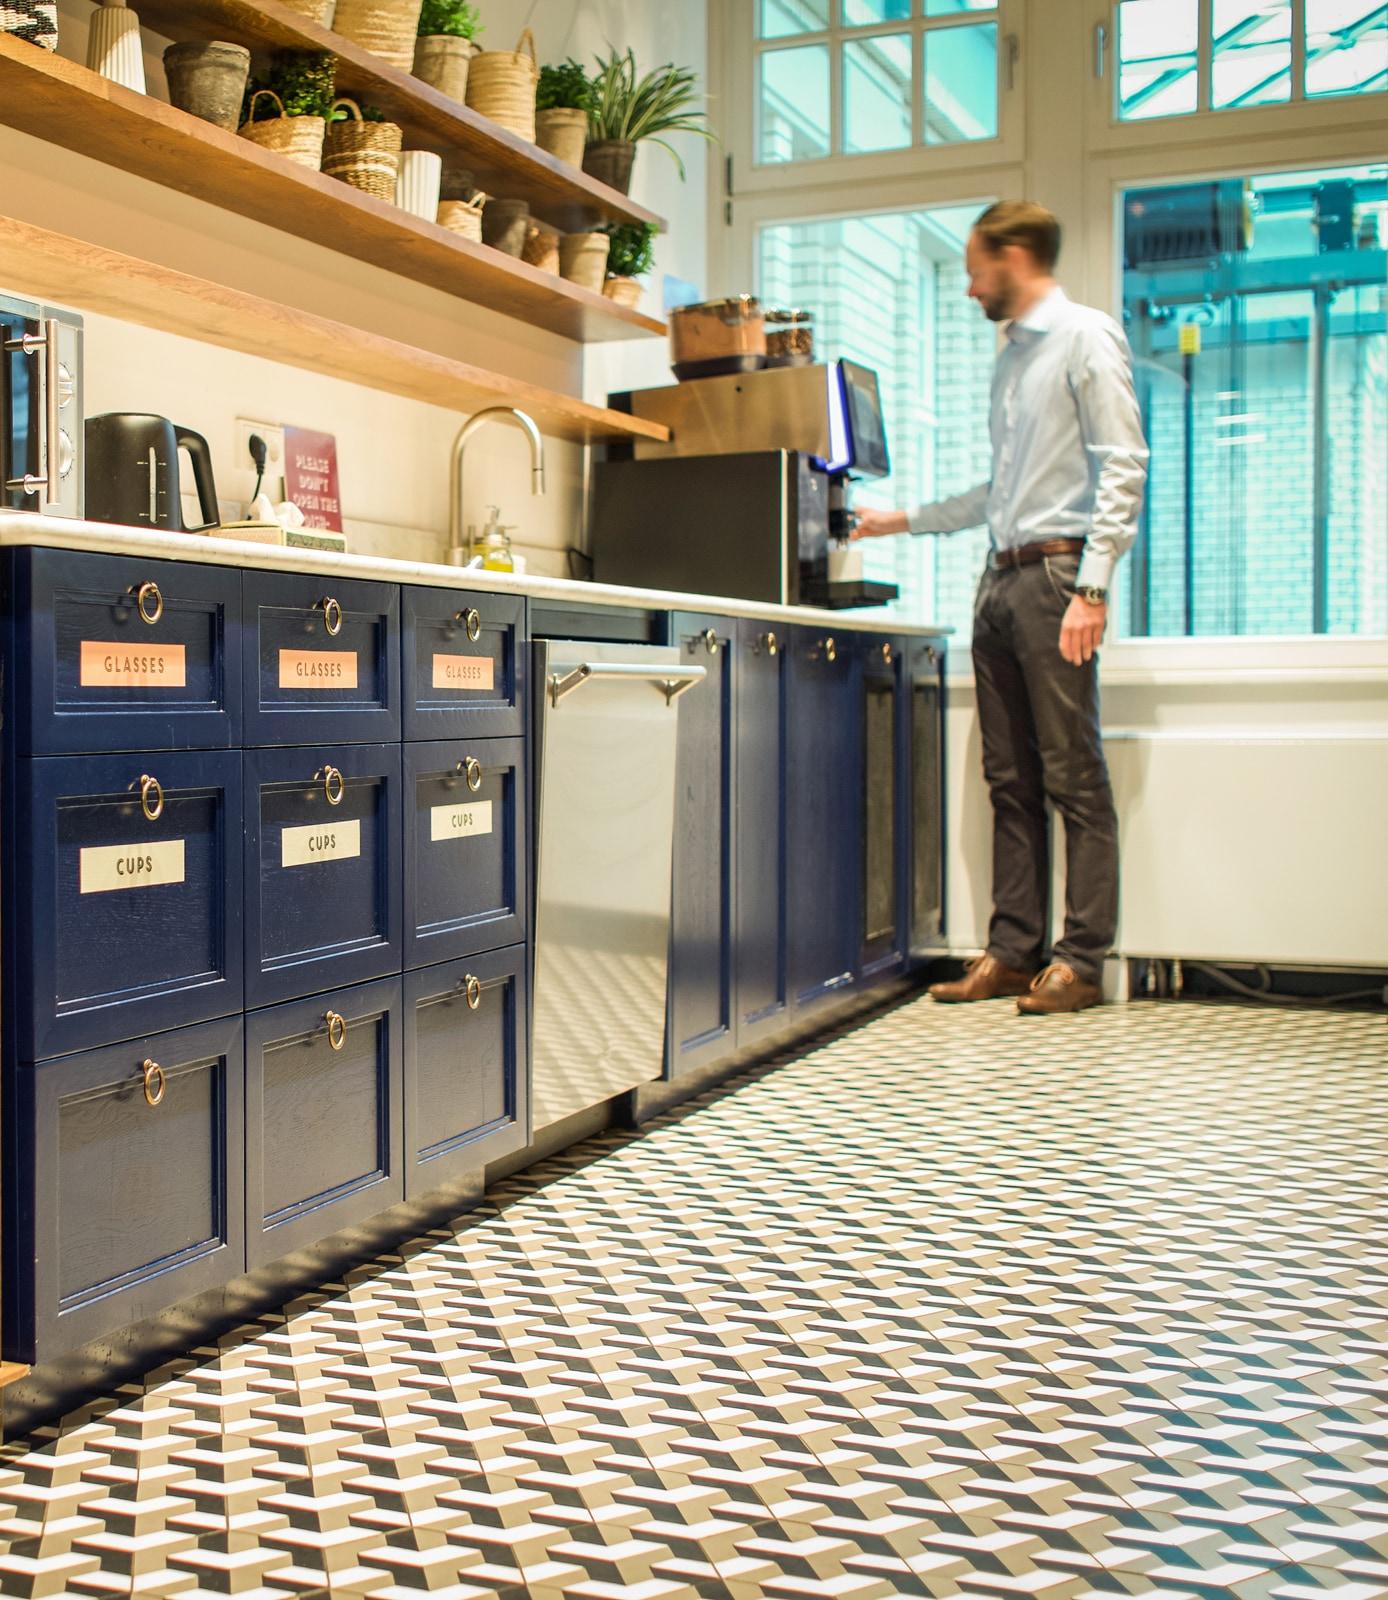 Coworkingspace-Berlin-zementfliesen-muster-600354-A-viaplatten | 600354